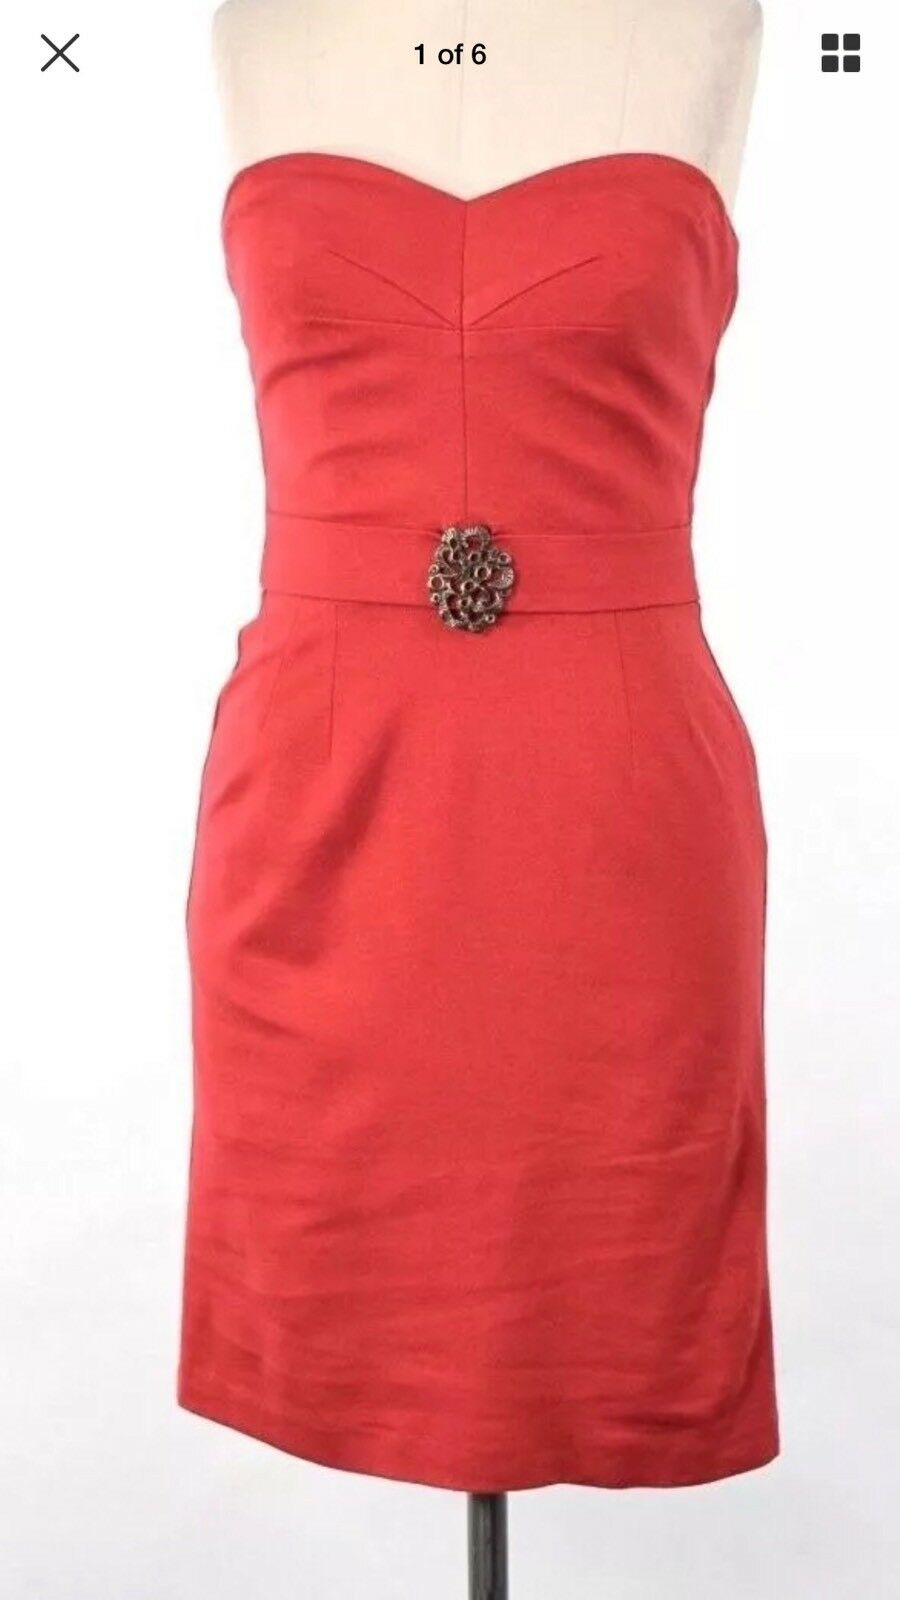 Cranberry Trina Turk Strapless Knit Knit Knit Dress NWT Size 12  328 55c6c4